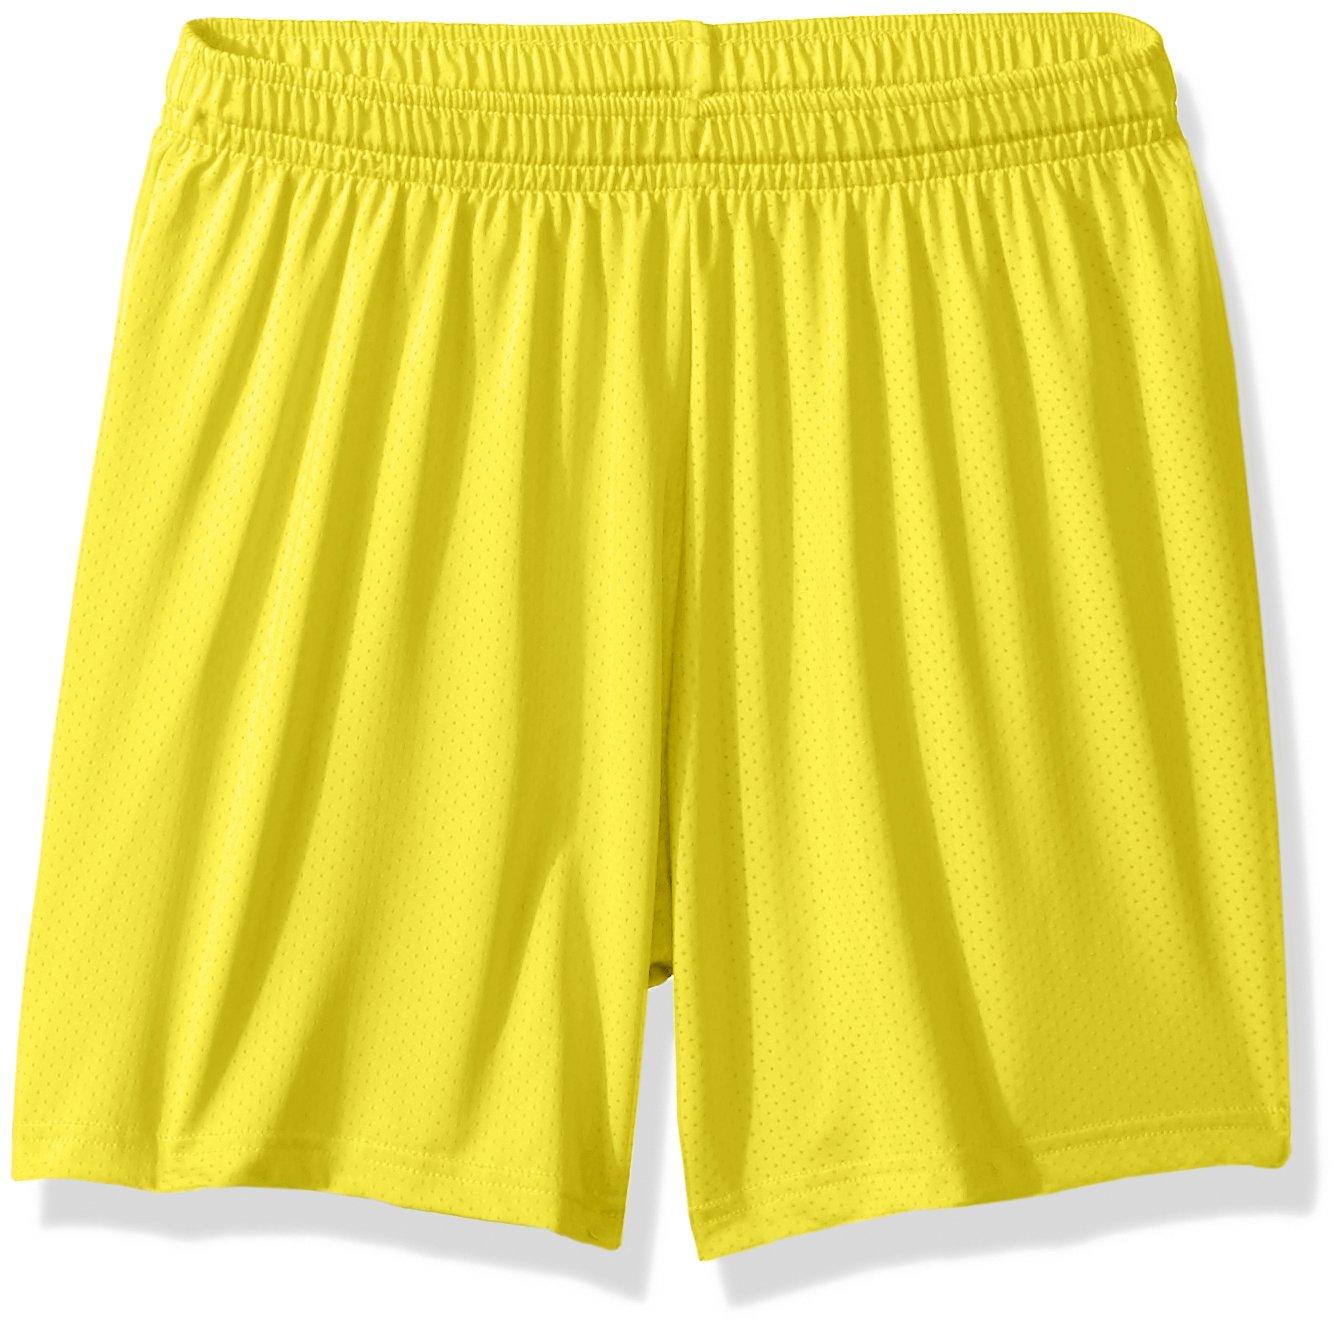 Augusta Sportswear Augusta Girls Inferno Short Augusta Sportswear Holdings Inc 1293-P